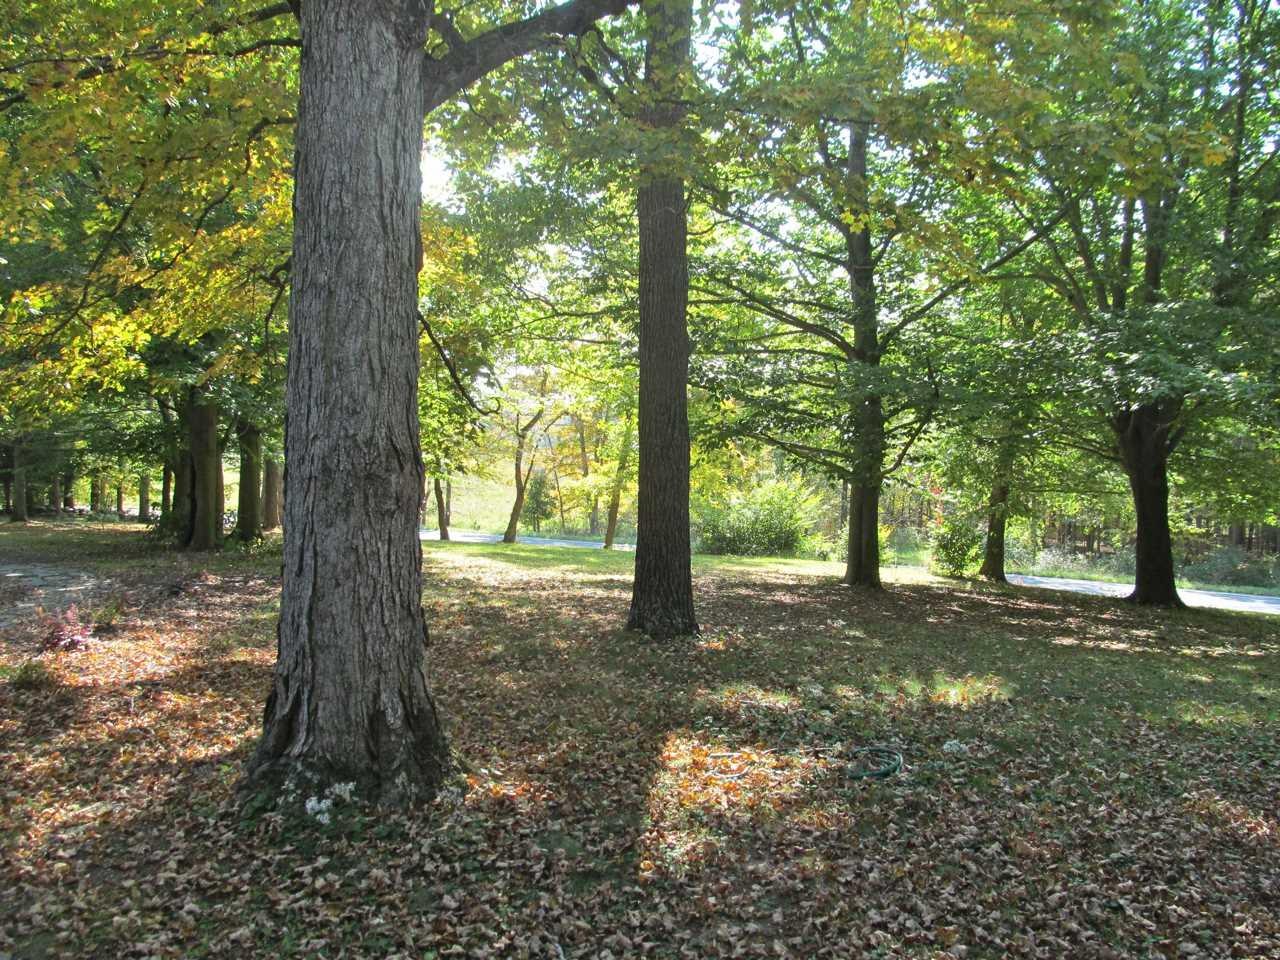 Land for Sale at 1658 BULLS HEAD ROAD 1658 BULLS HEAD ROAD Stanfordville, New York 12581 United States